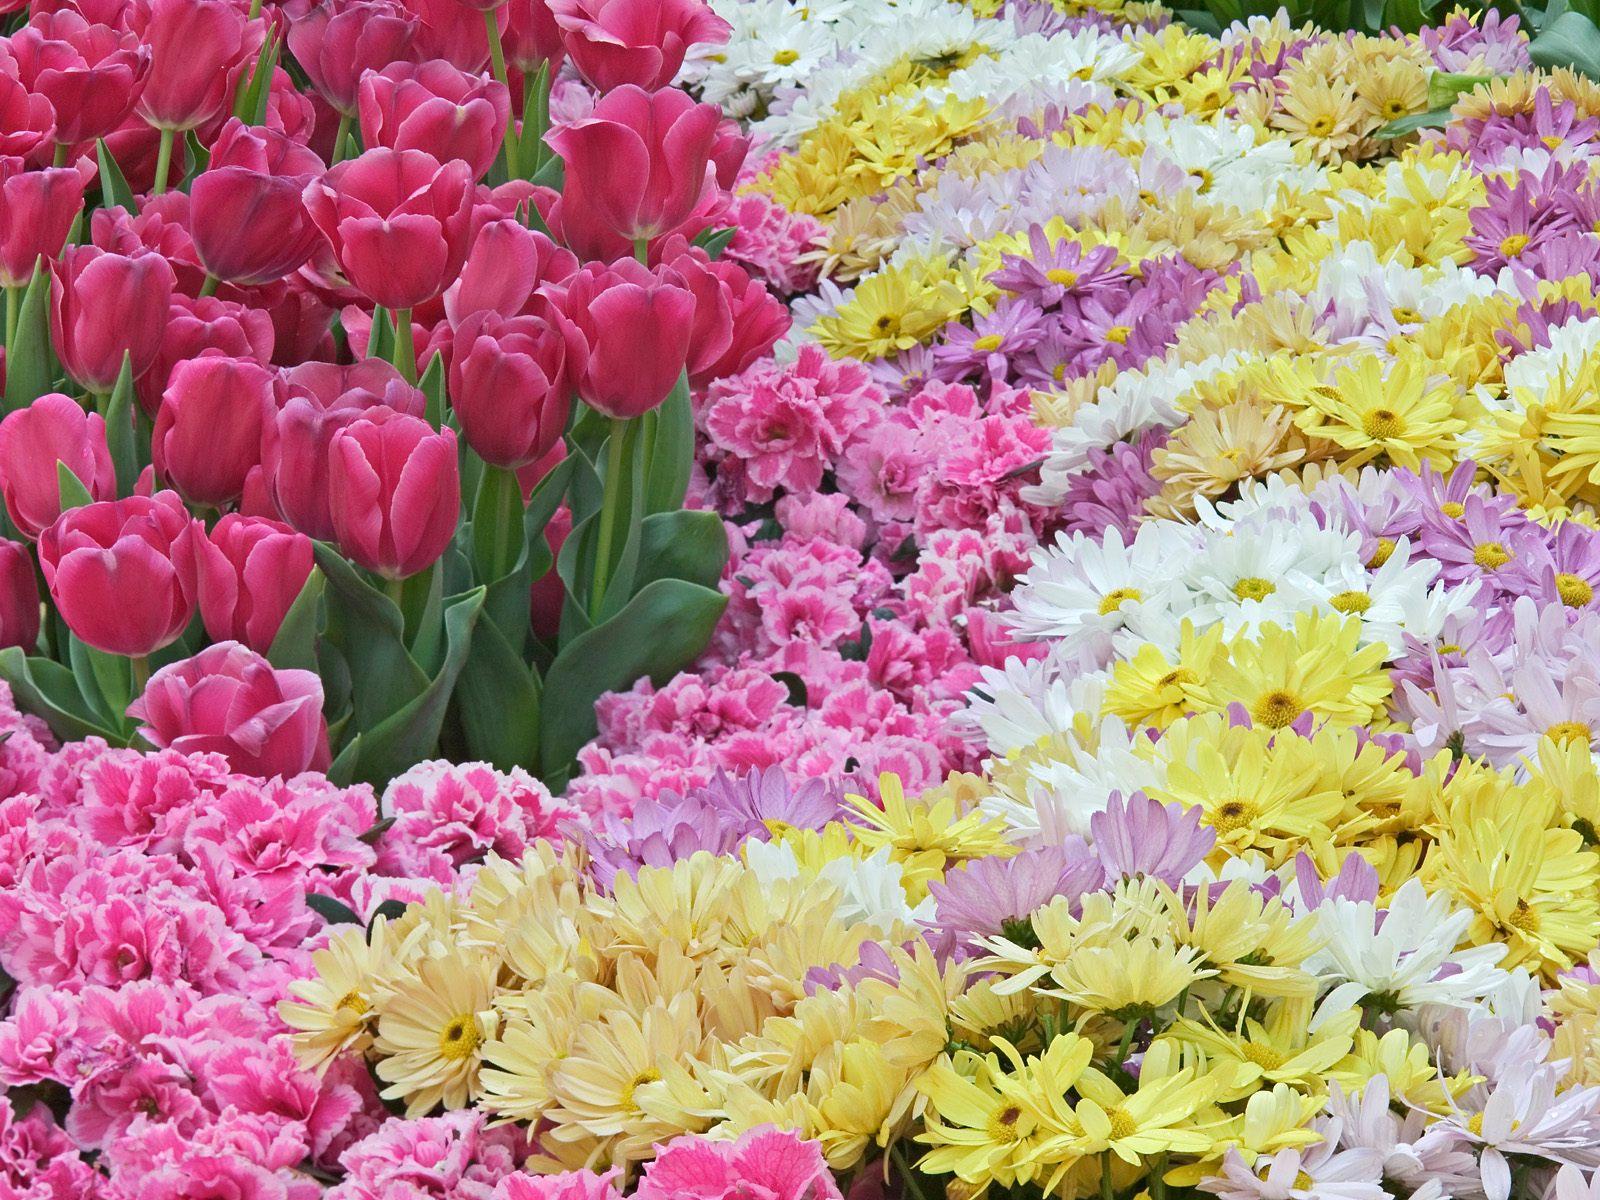 Natural flower wallpaper top hd wallpapers - Nature flower hd wallpaper download ...